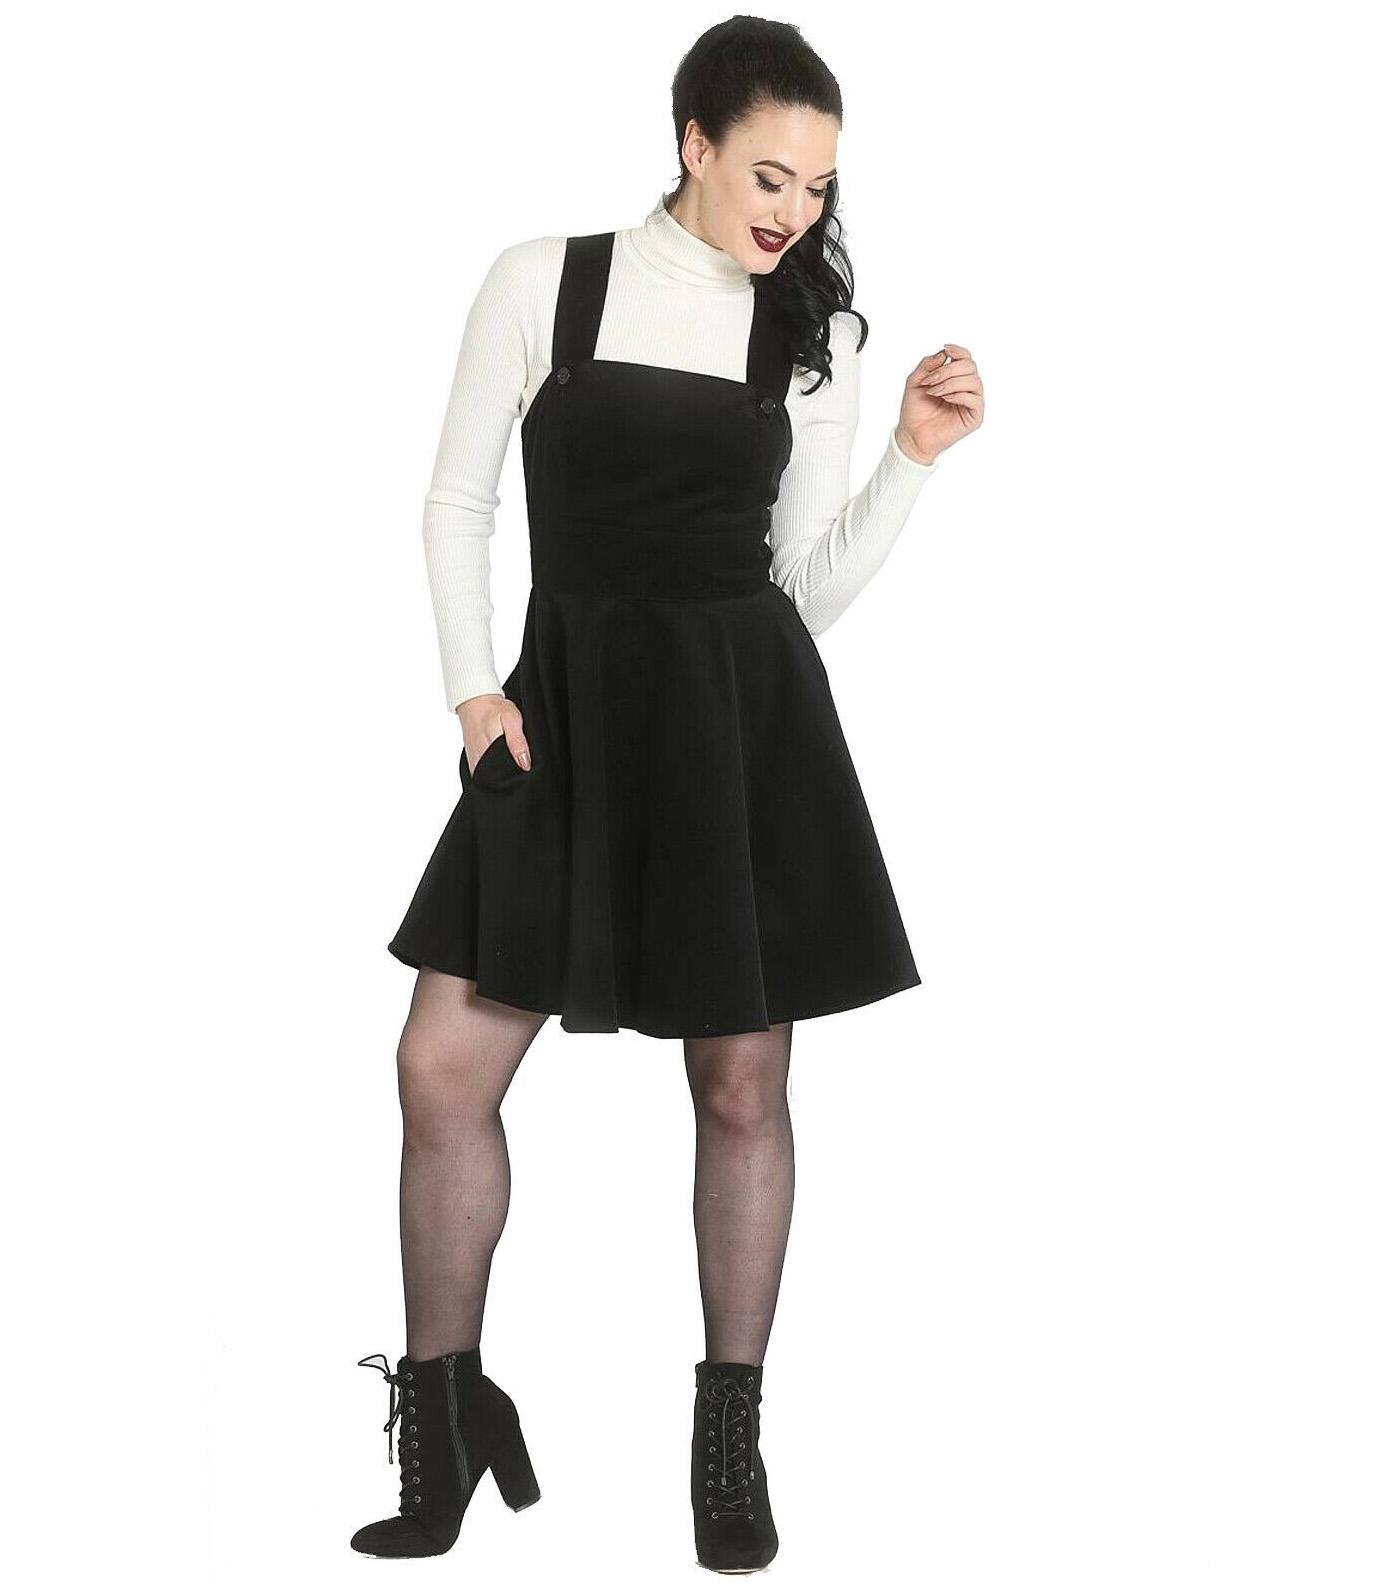 Hell-Bunny-Rockabilly-Corduroy-Mini-Dress-WONDER-YEARS-Pinafore-Black-All-Sizes thumbnail 31